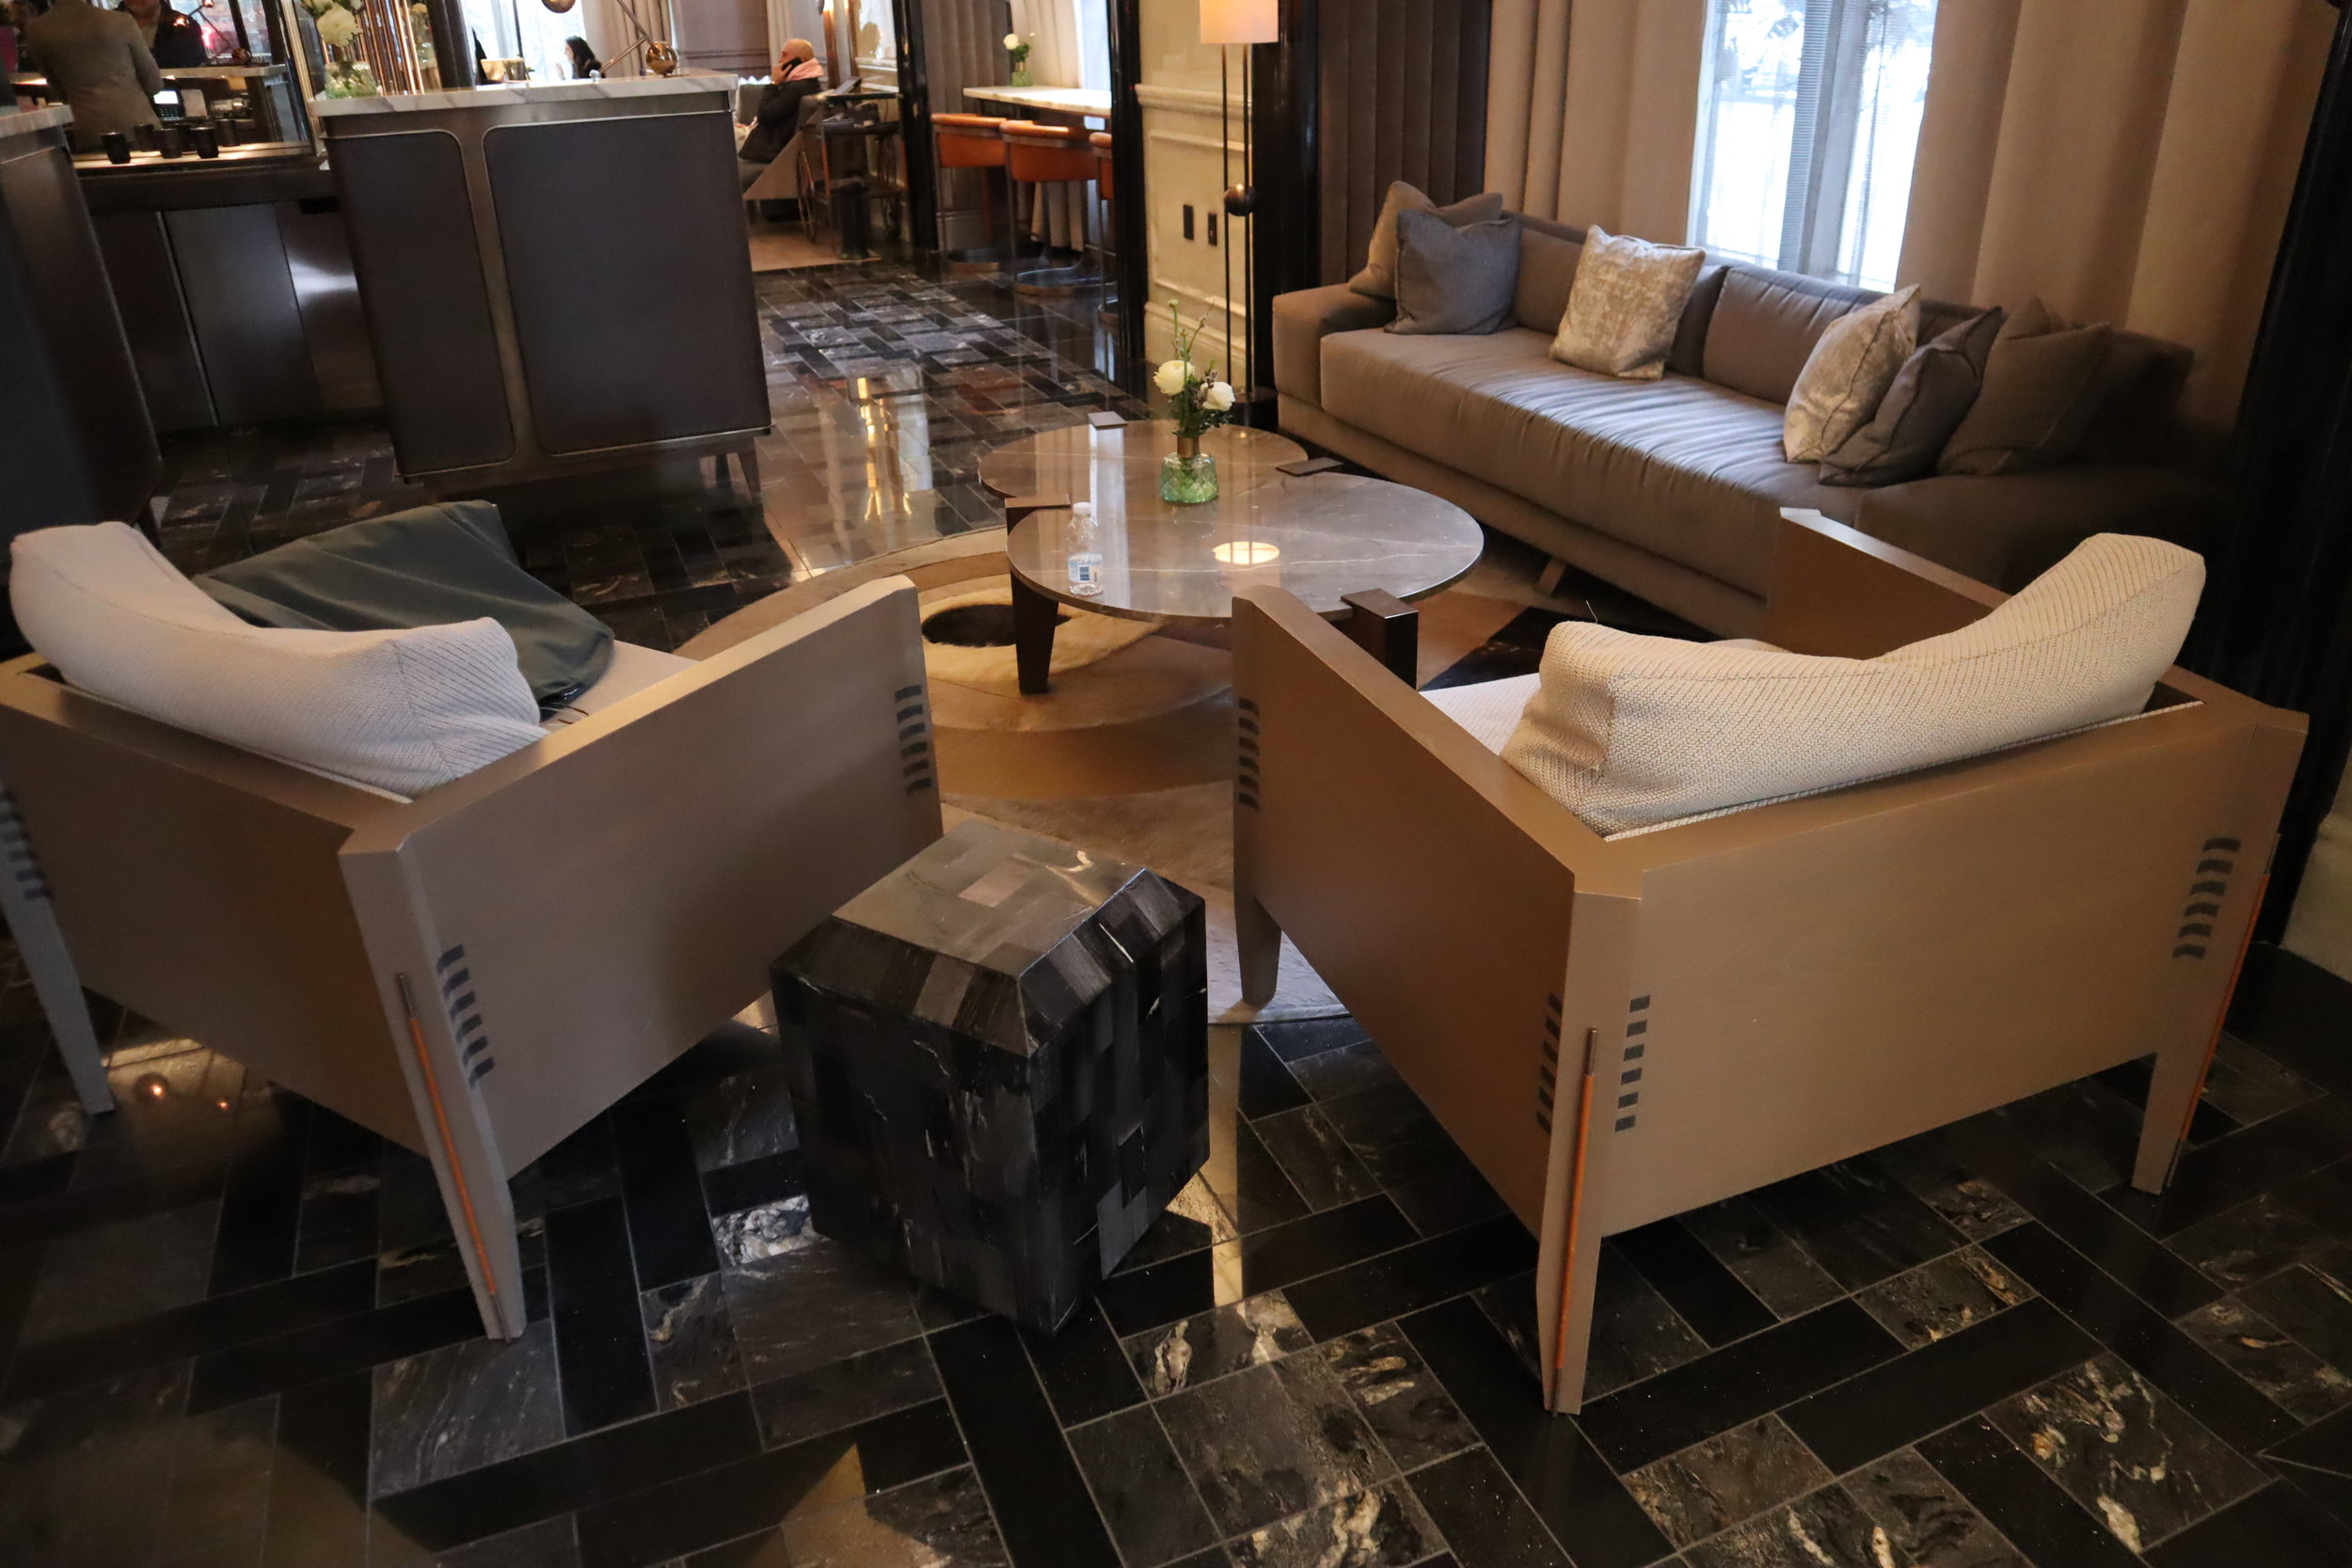 St. Regis Toronto – Lobby sitting area